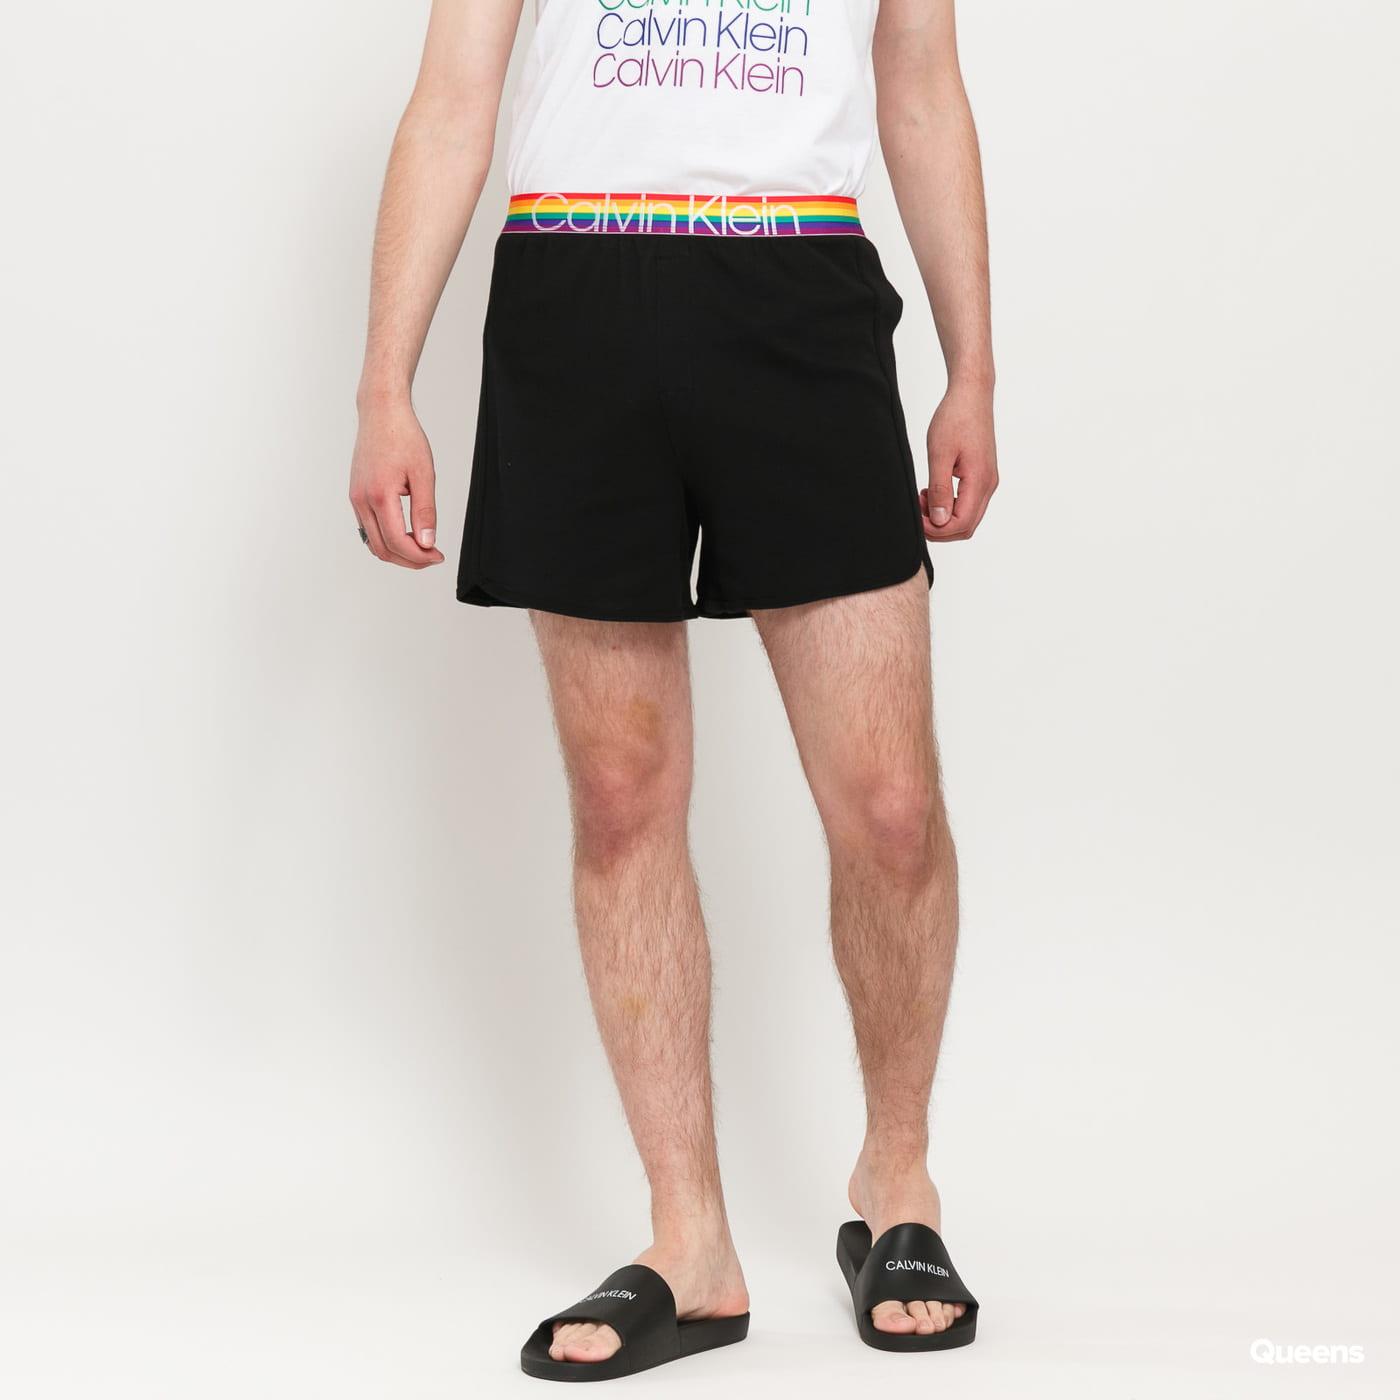 Calvin Klein Sleep Short black / multicolor